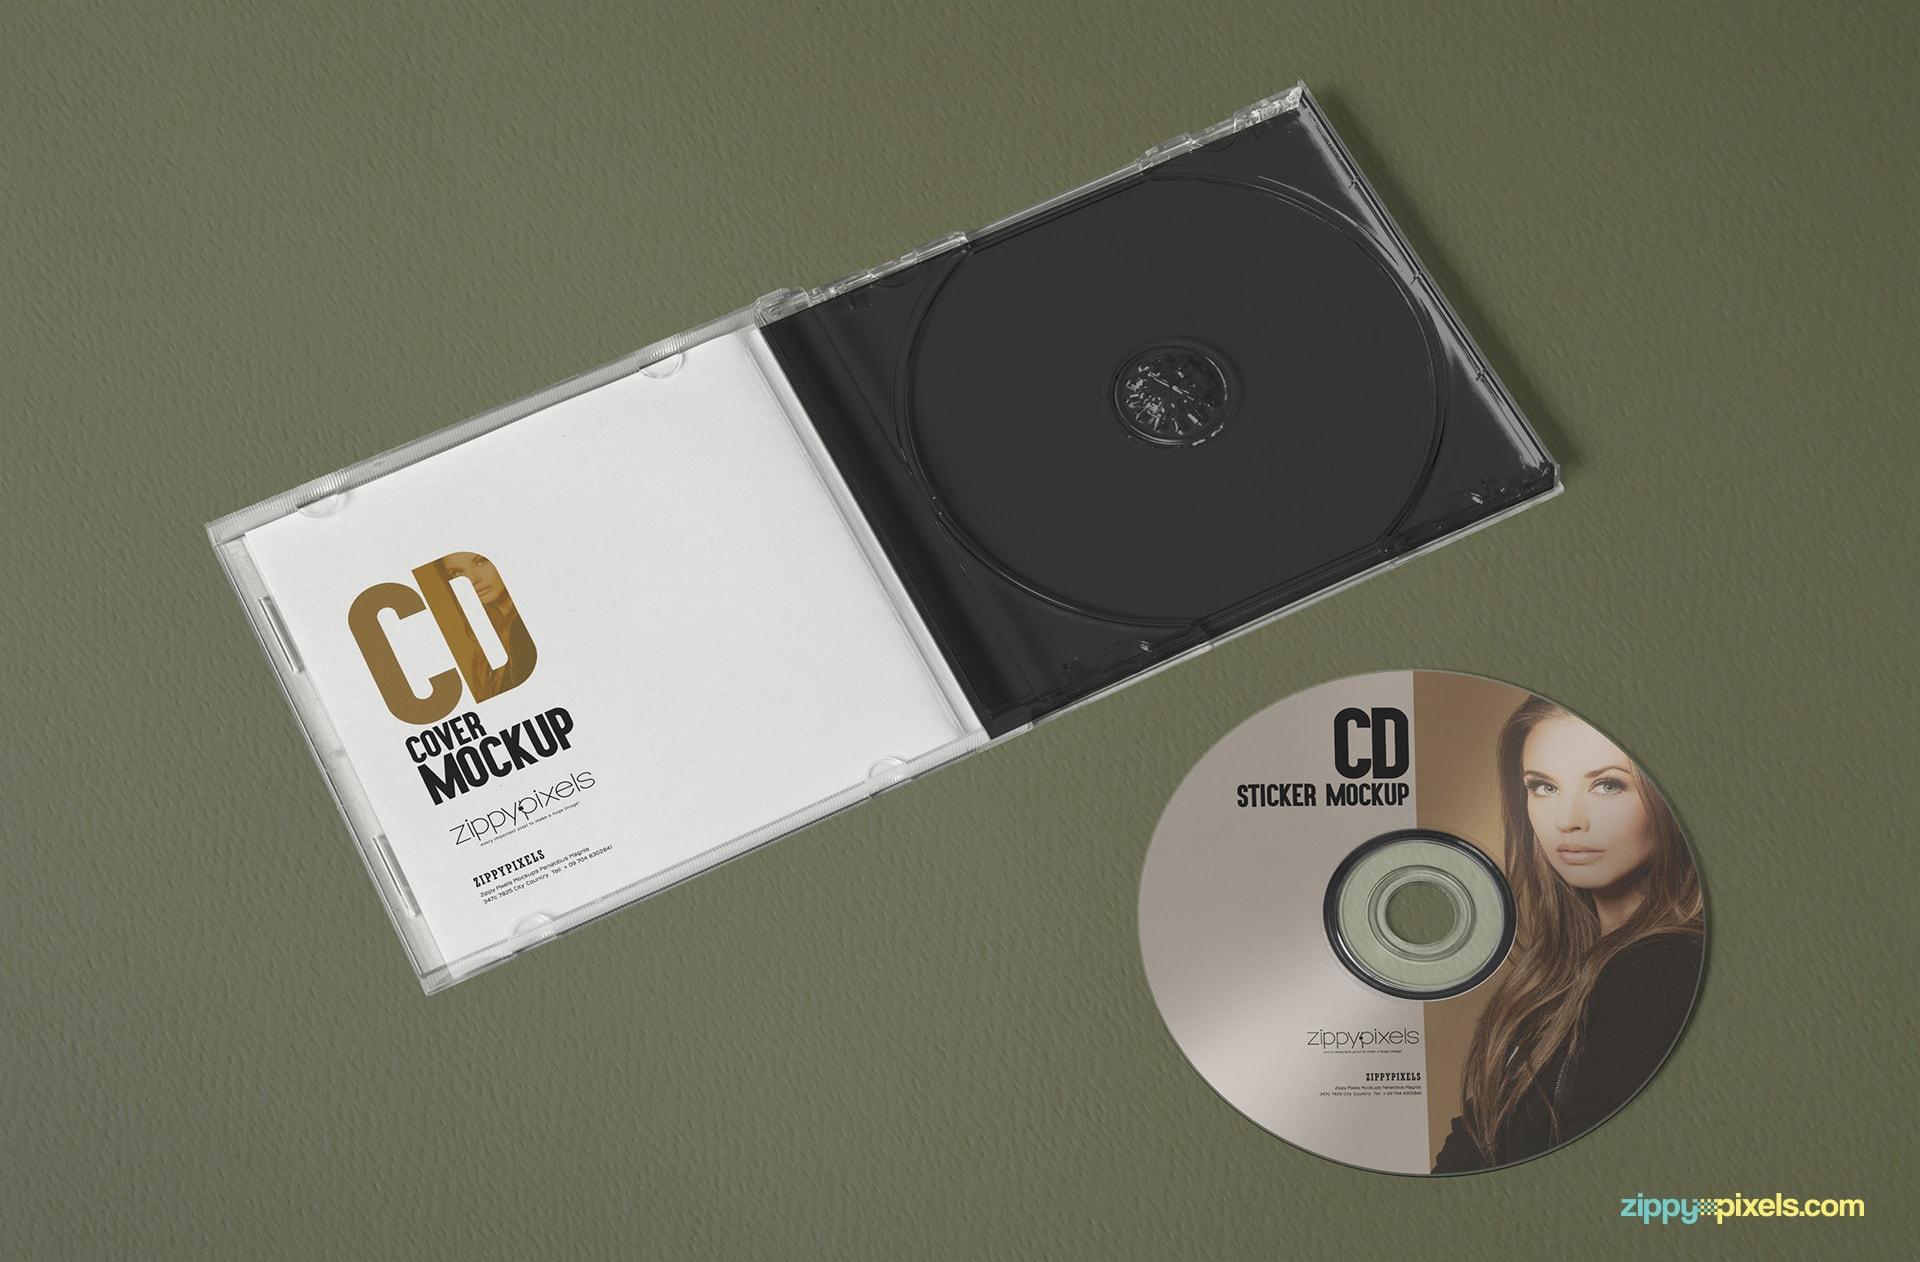 plastic-cd-jewel-case-mockup-01-min